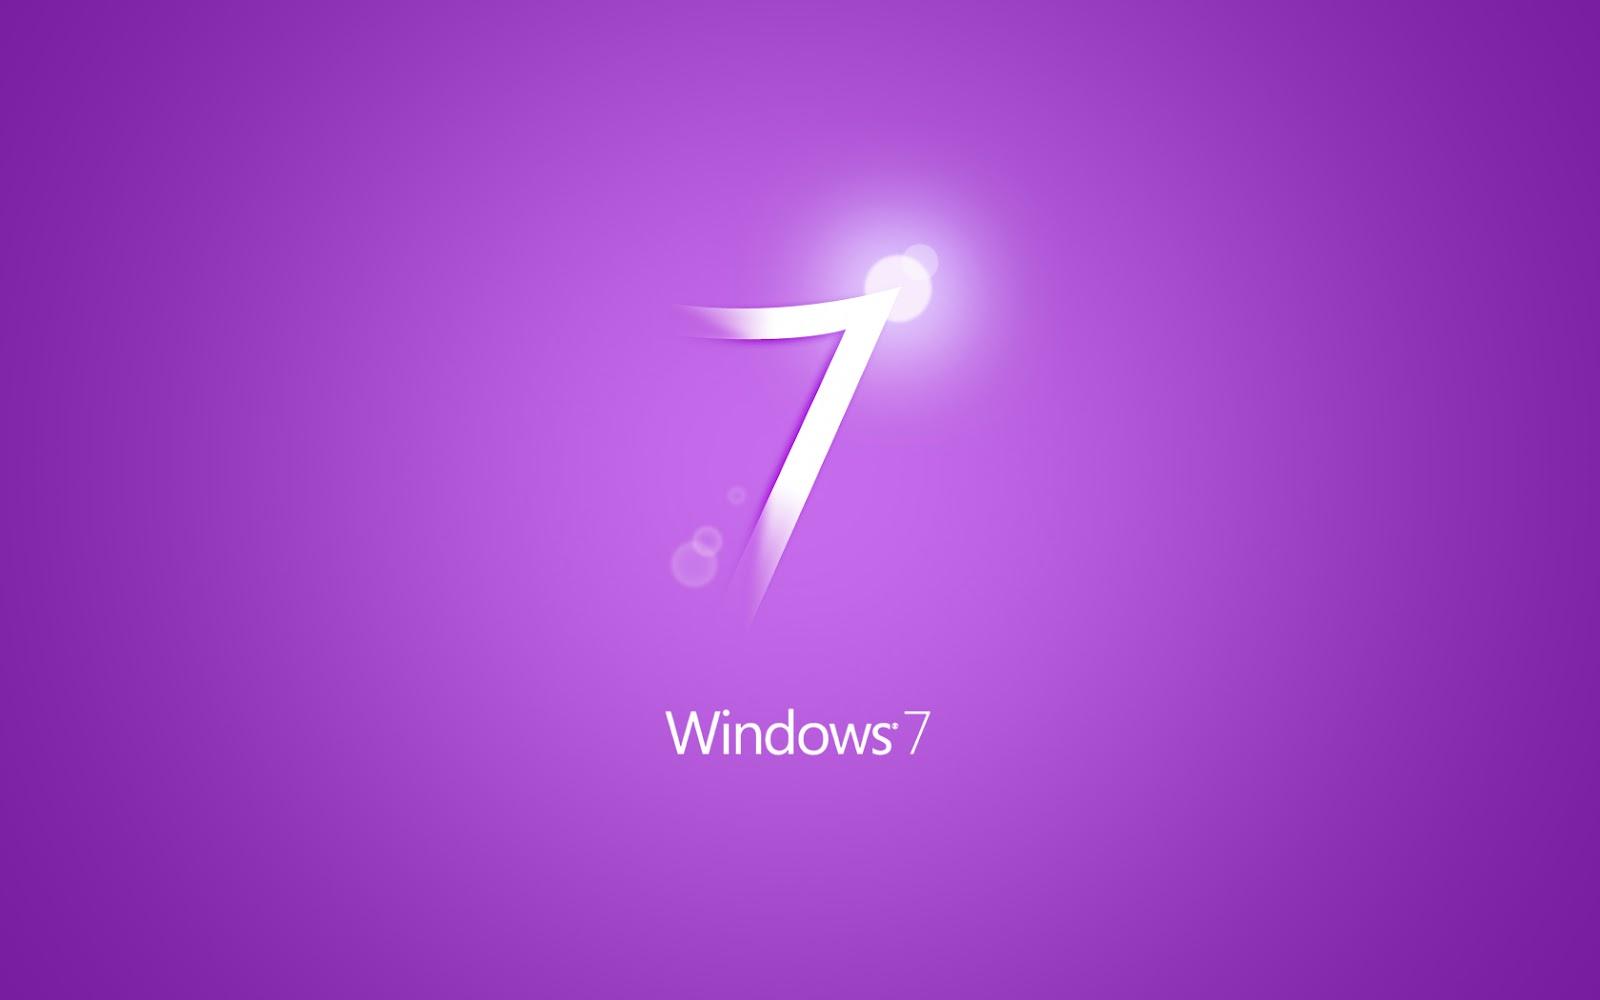 http://2.bp.blogspot.com/-oRWpEF4TLPE/TzeTrDLQyKI/AAAAAAAAFaY/rGxb3VqgQzM/s1600/Windows+7+Wallpapers+1.jpg